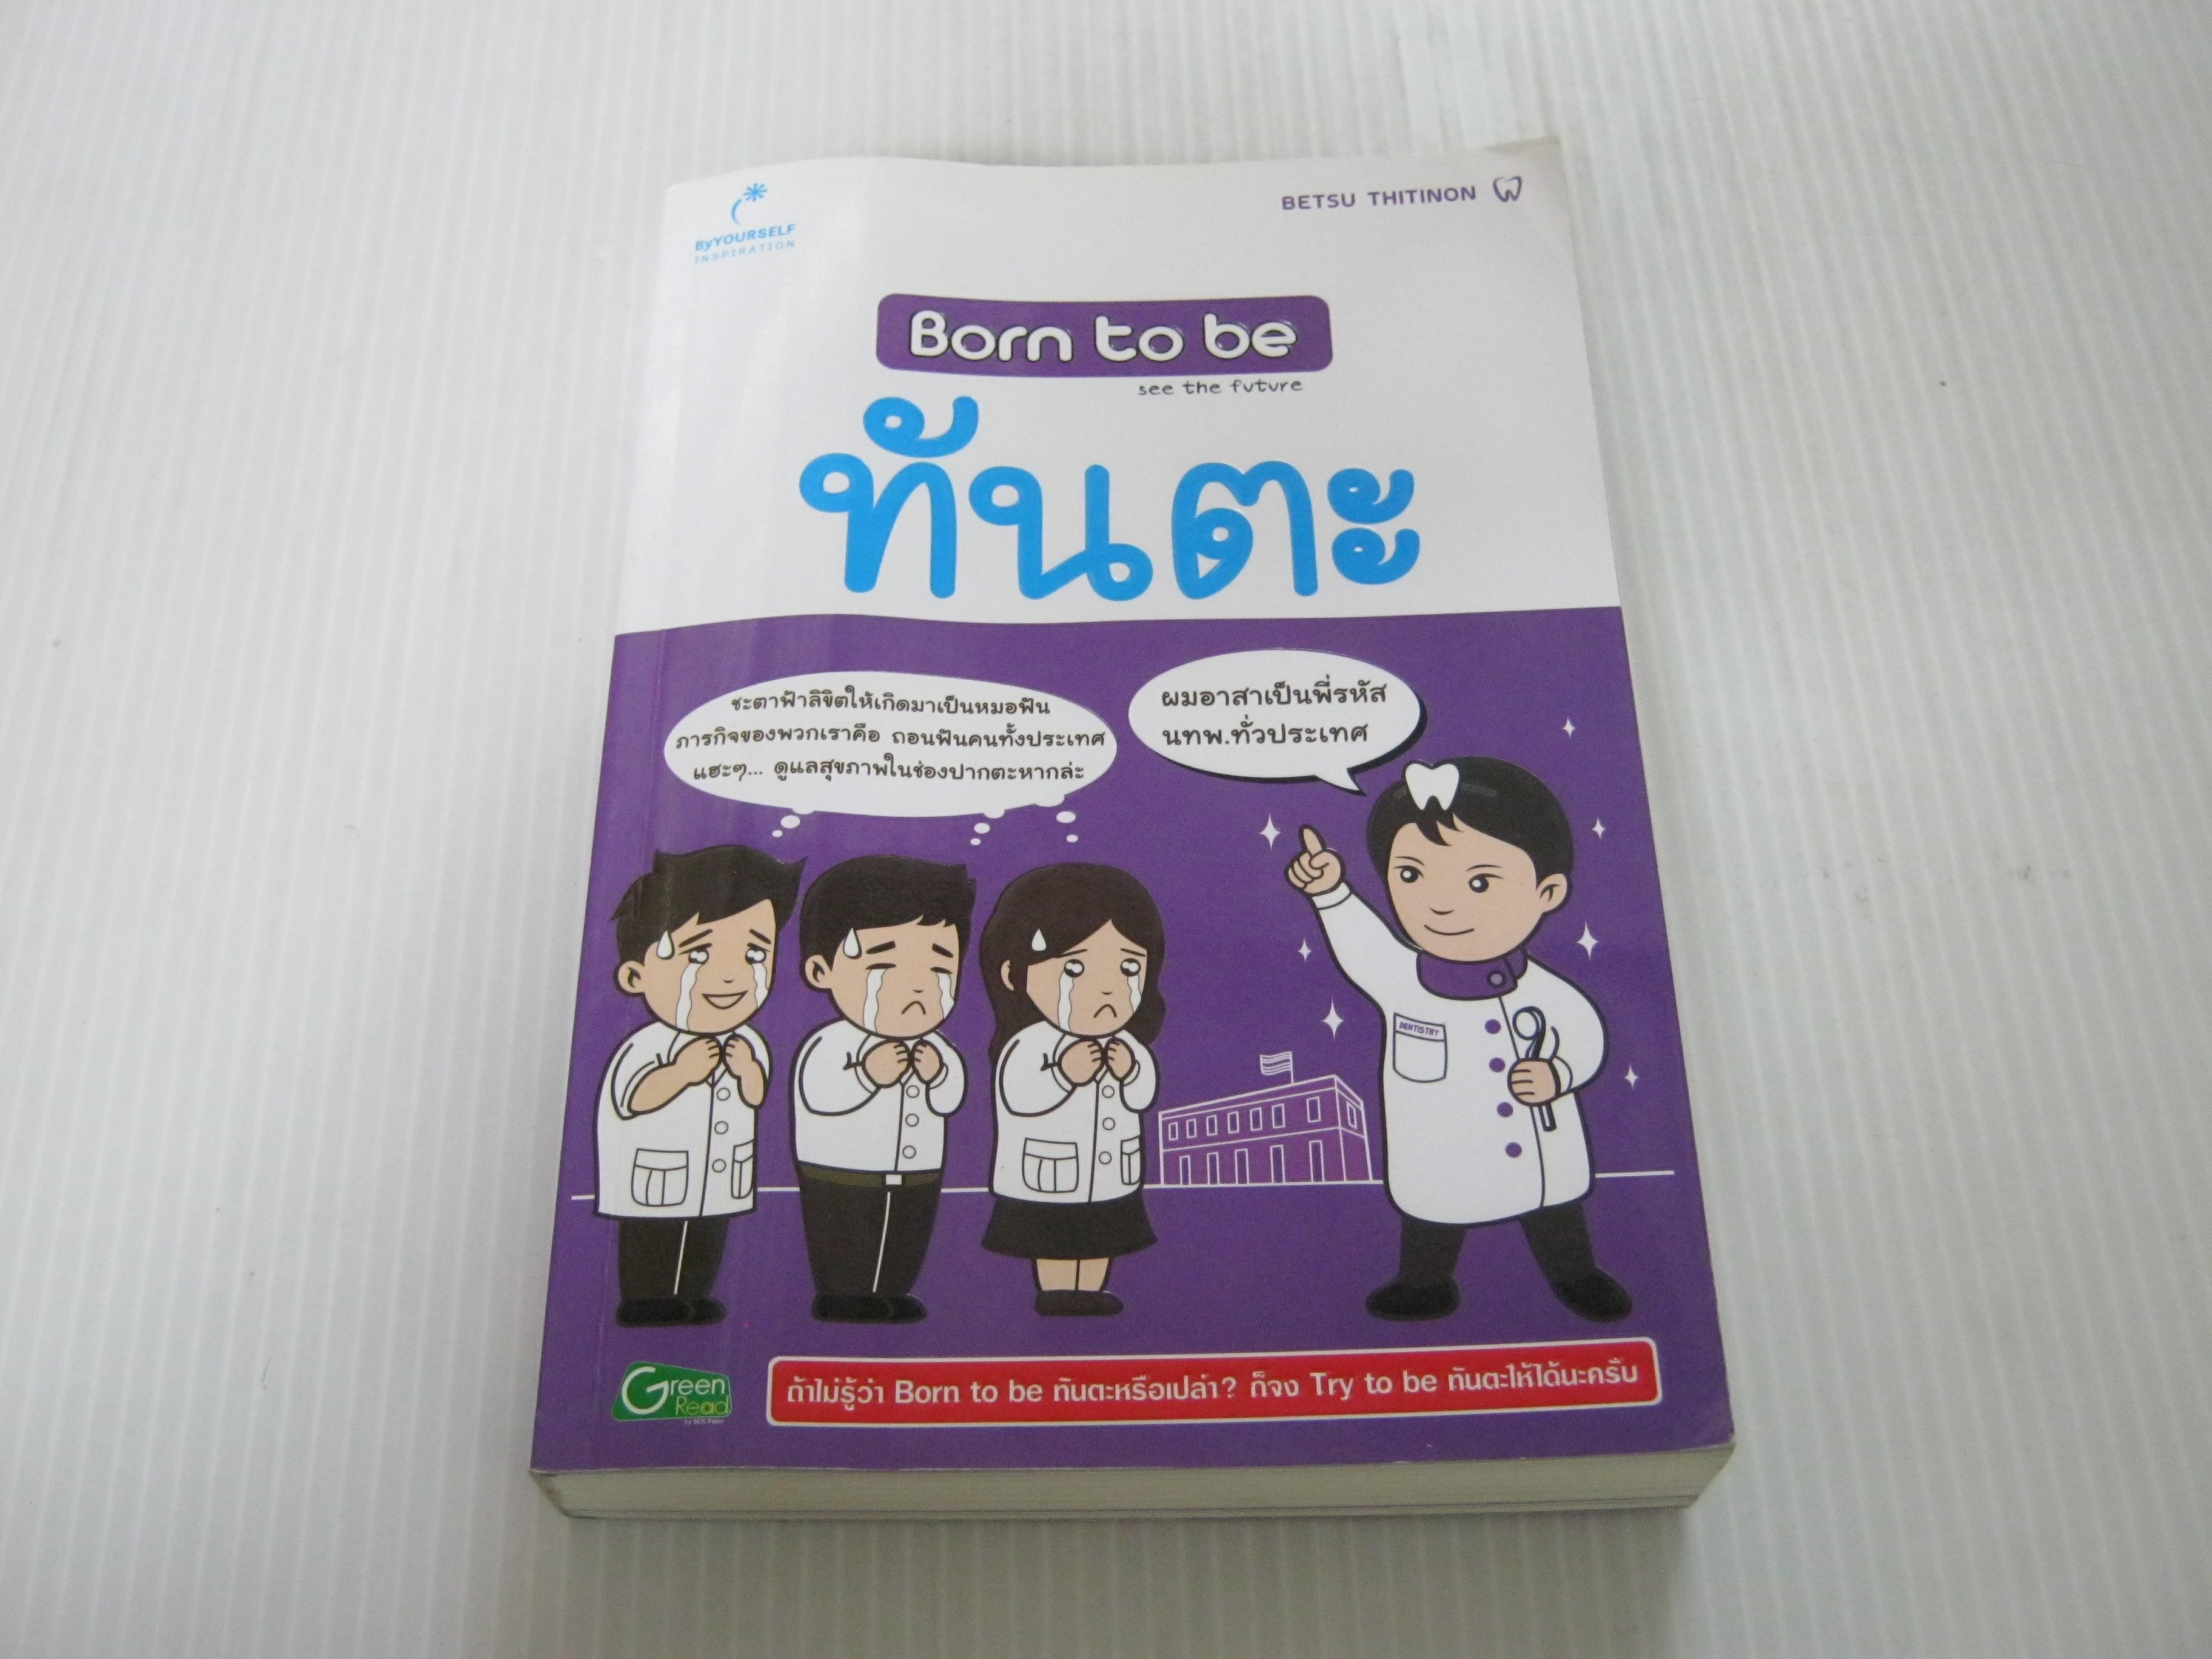 Born to be ทันตะ โดย Betsu Thitinon